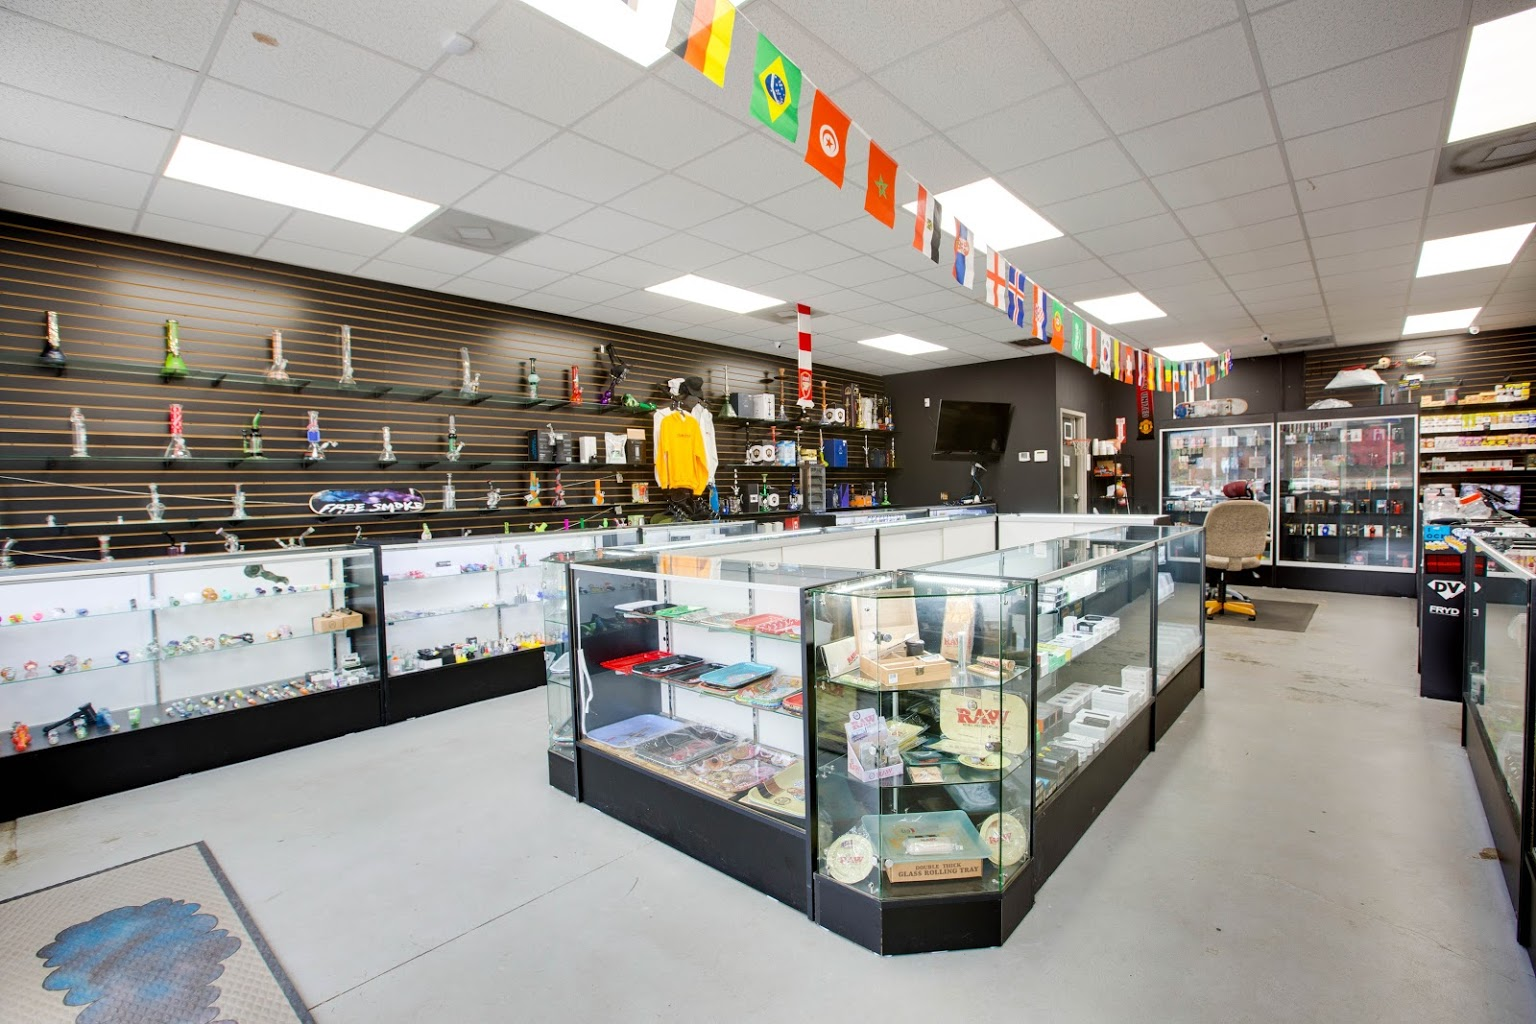 interior of Free Smoke Vape and Smoke Shop on Indian Trail Lilburn Rd Norcross, GA